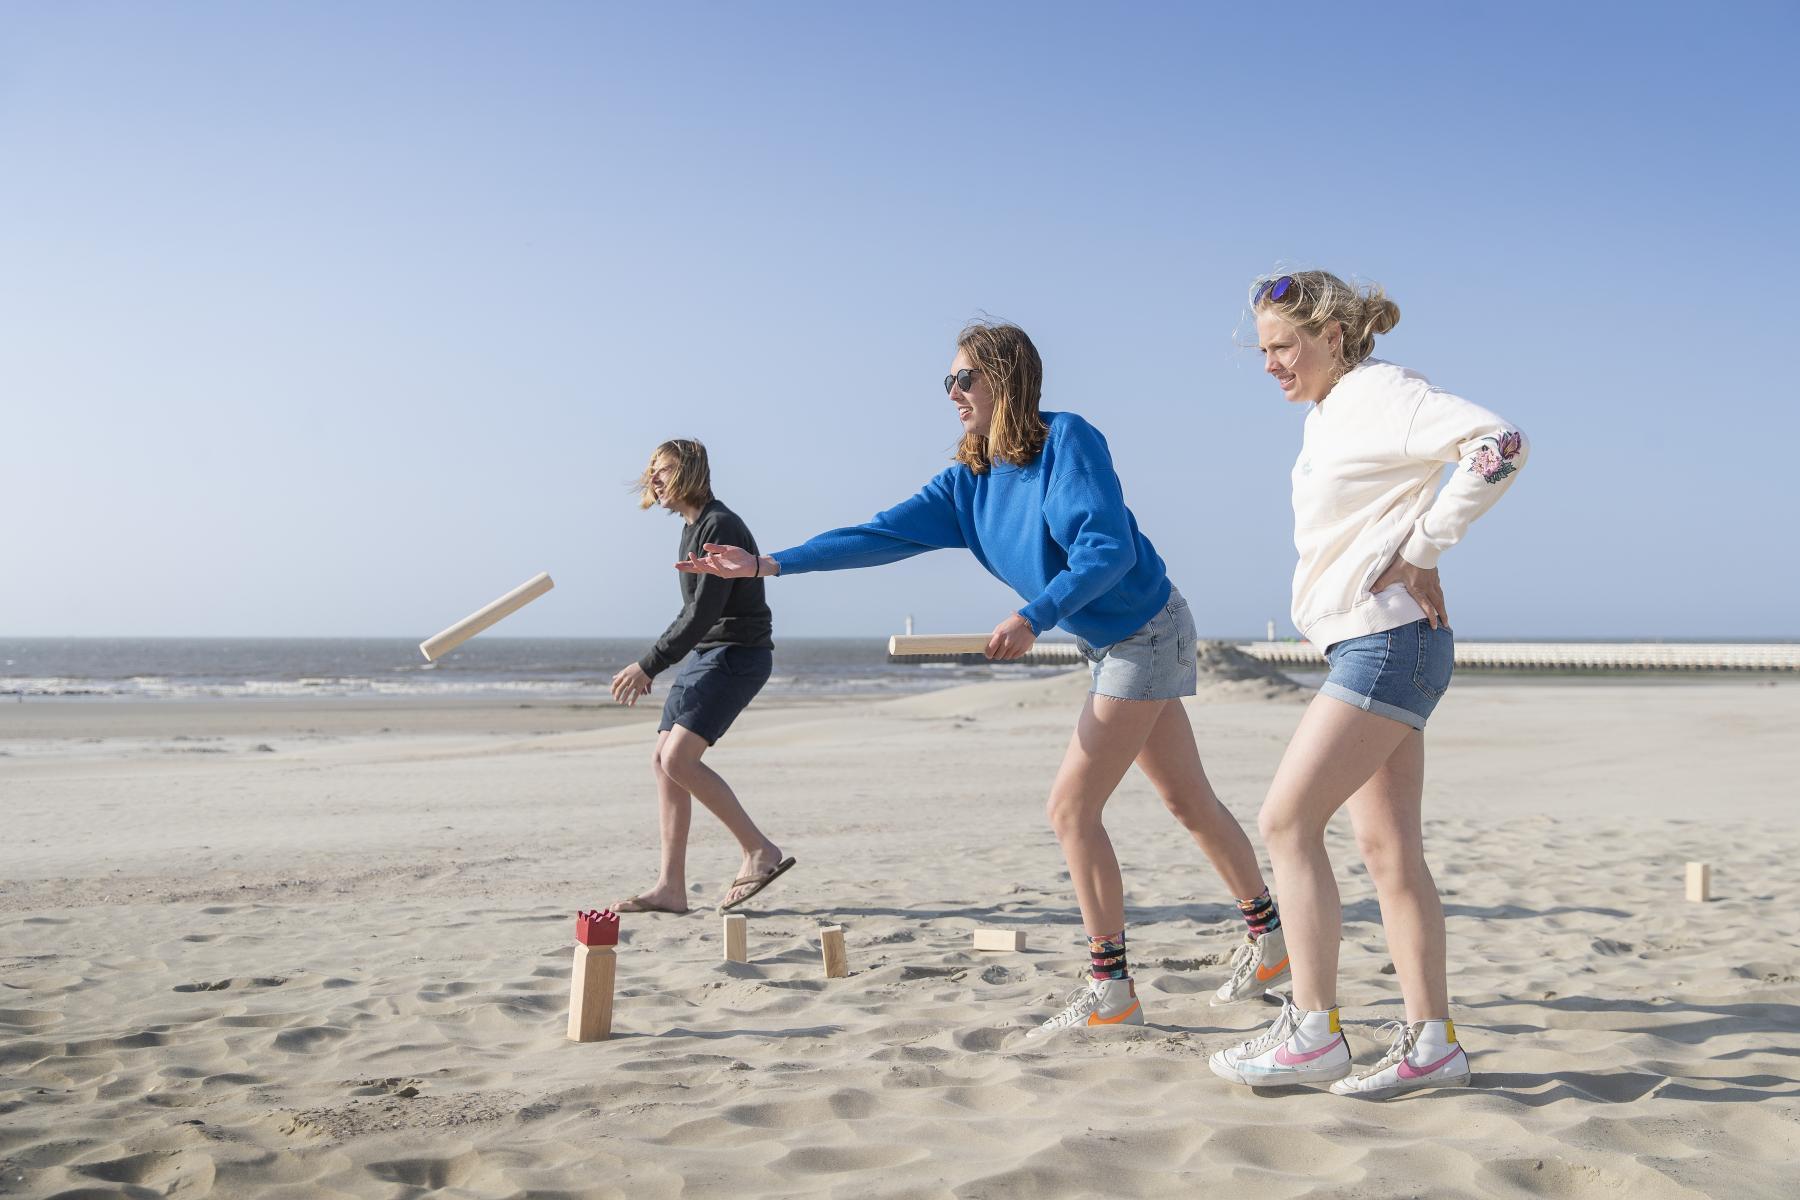 Visit Nieuwpoort - Sportstrand The beach to play